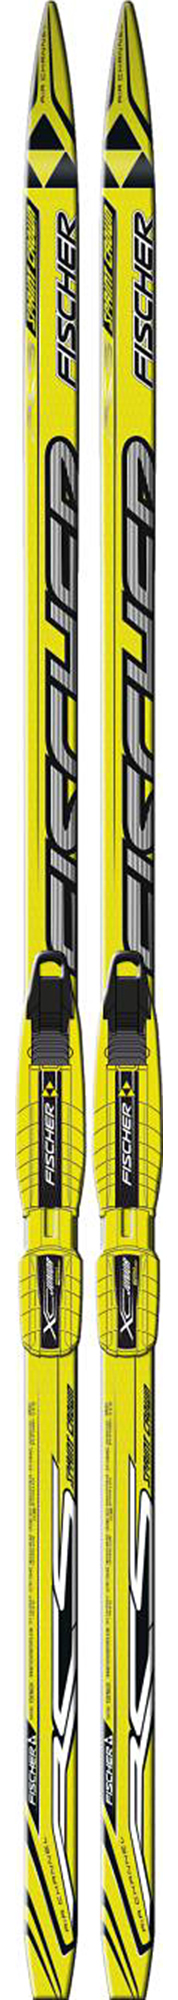 Fischer Лыжи беговые юниорские Fischer Sprint Crown беговые лыжи tisa 90515 top universal 197